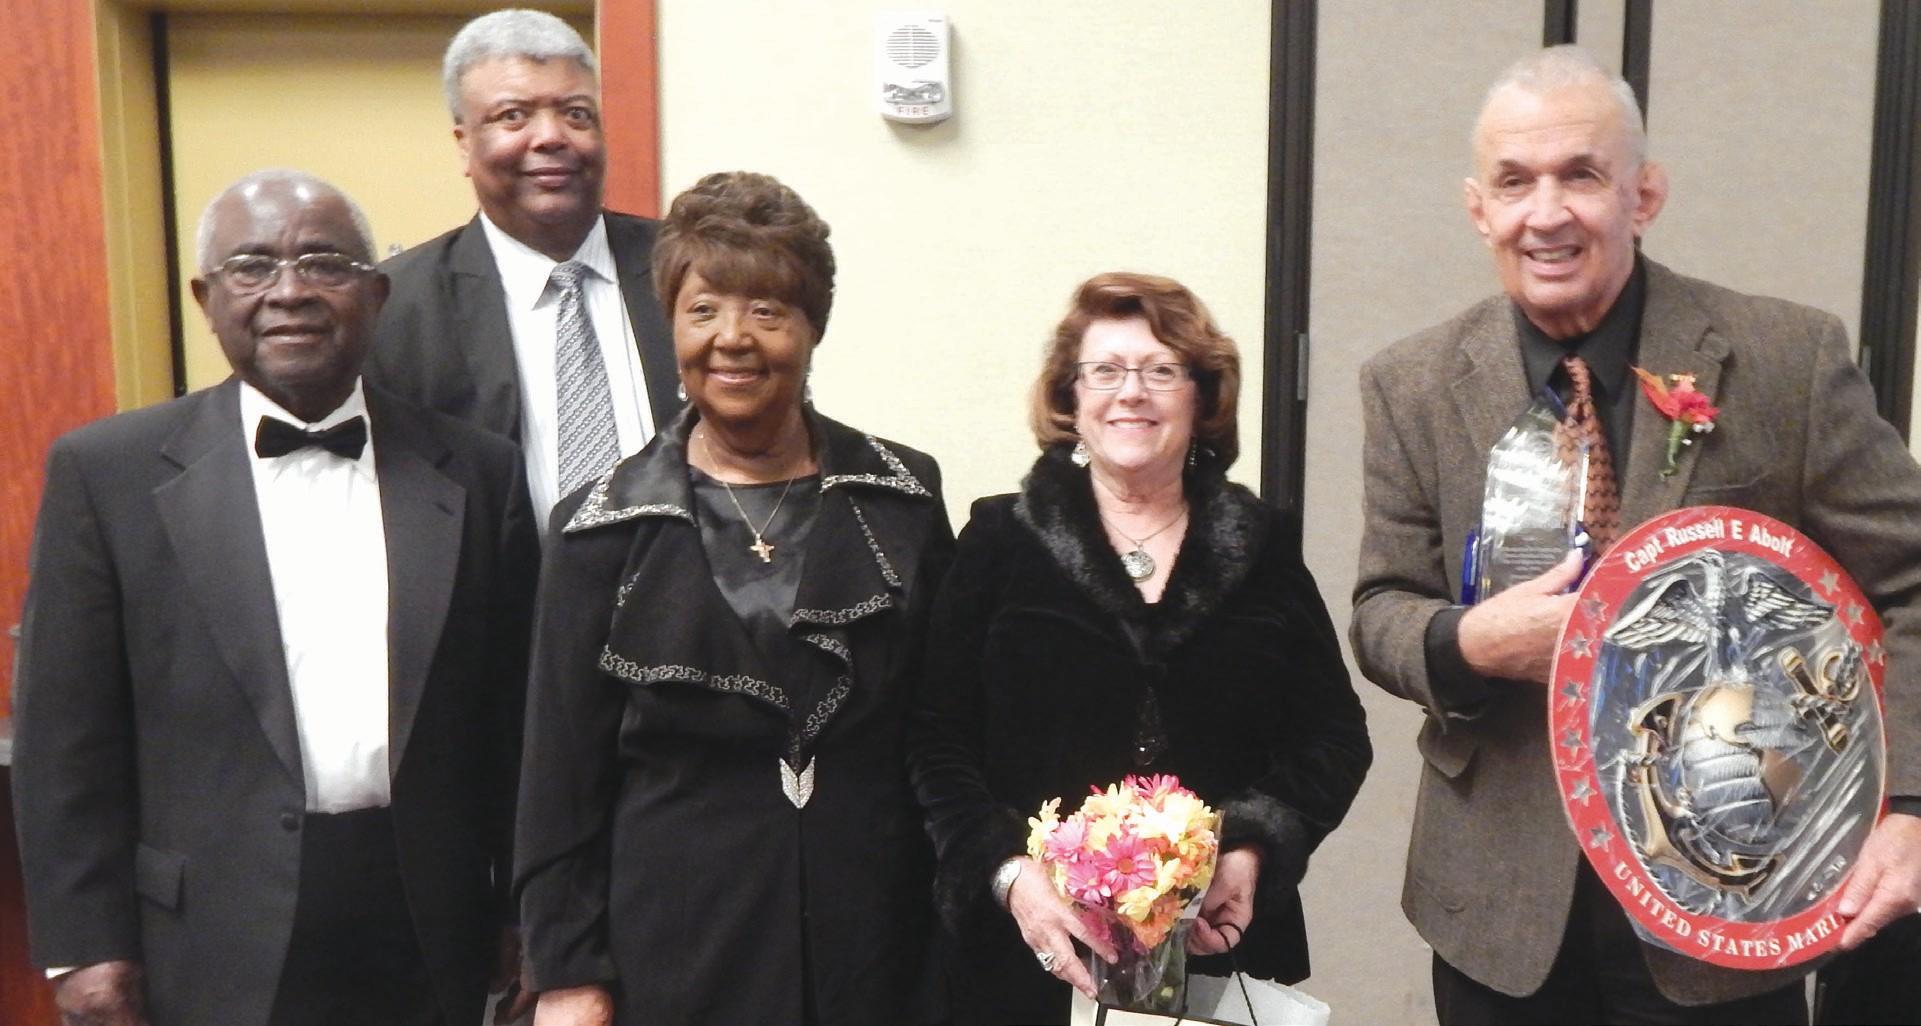 (L-R) Nathaniel Thomas, Col. George Bowen, Dr. Priscilla Thomas, Diane Abolt, and Russ Abolt